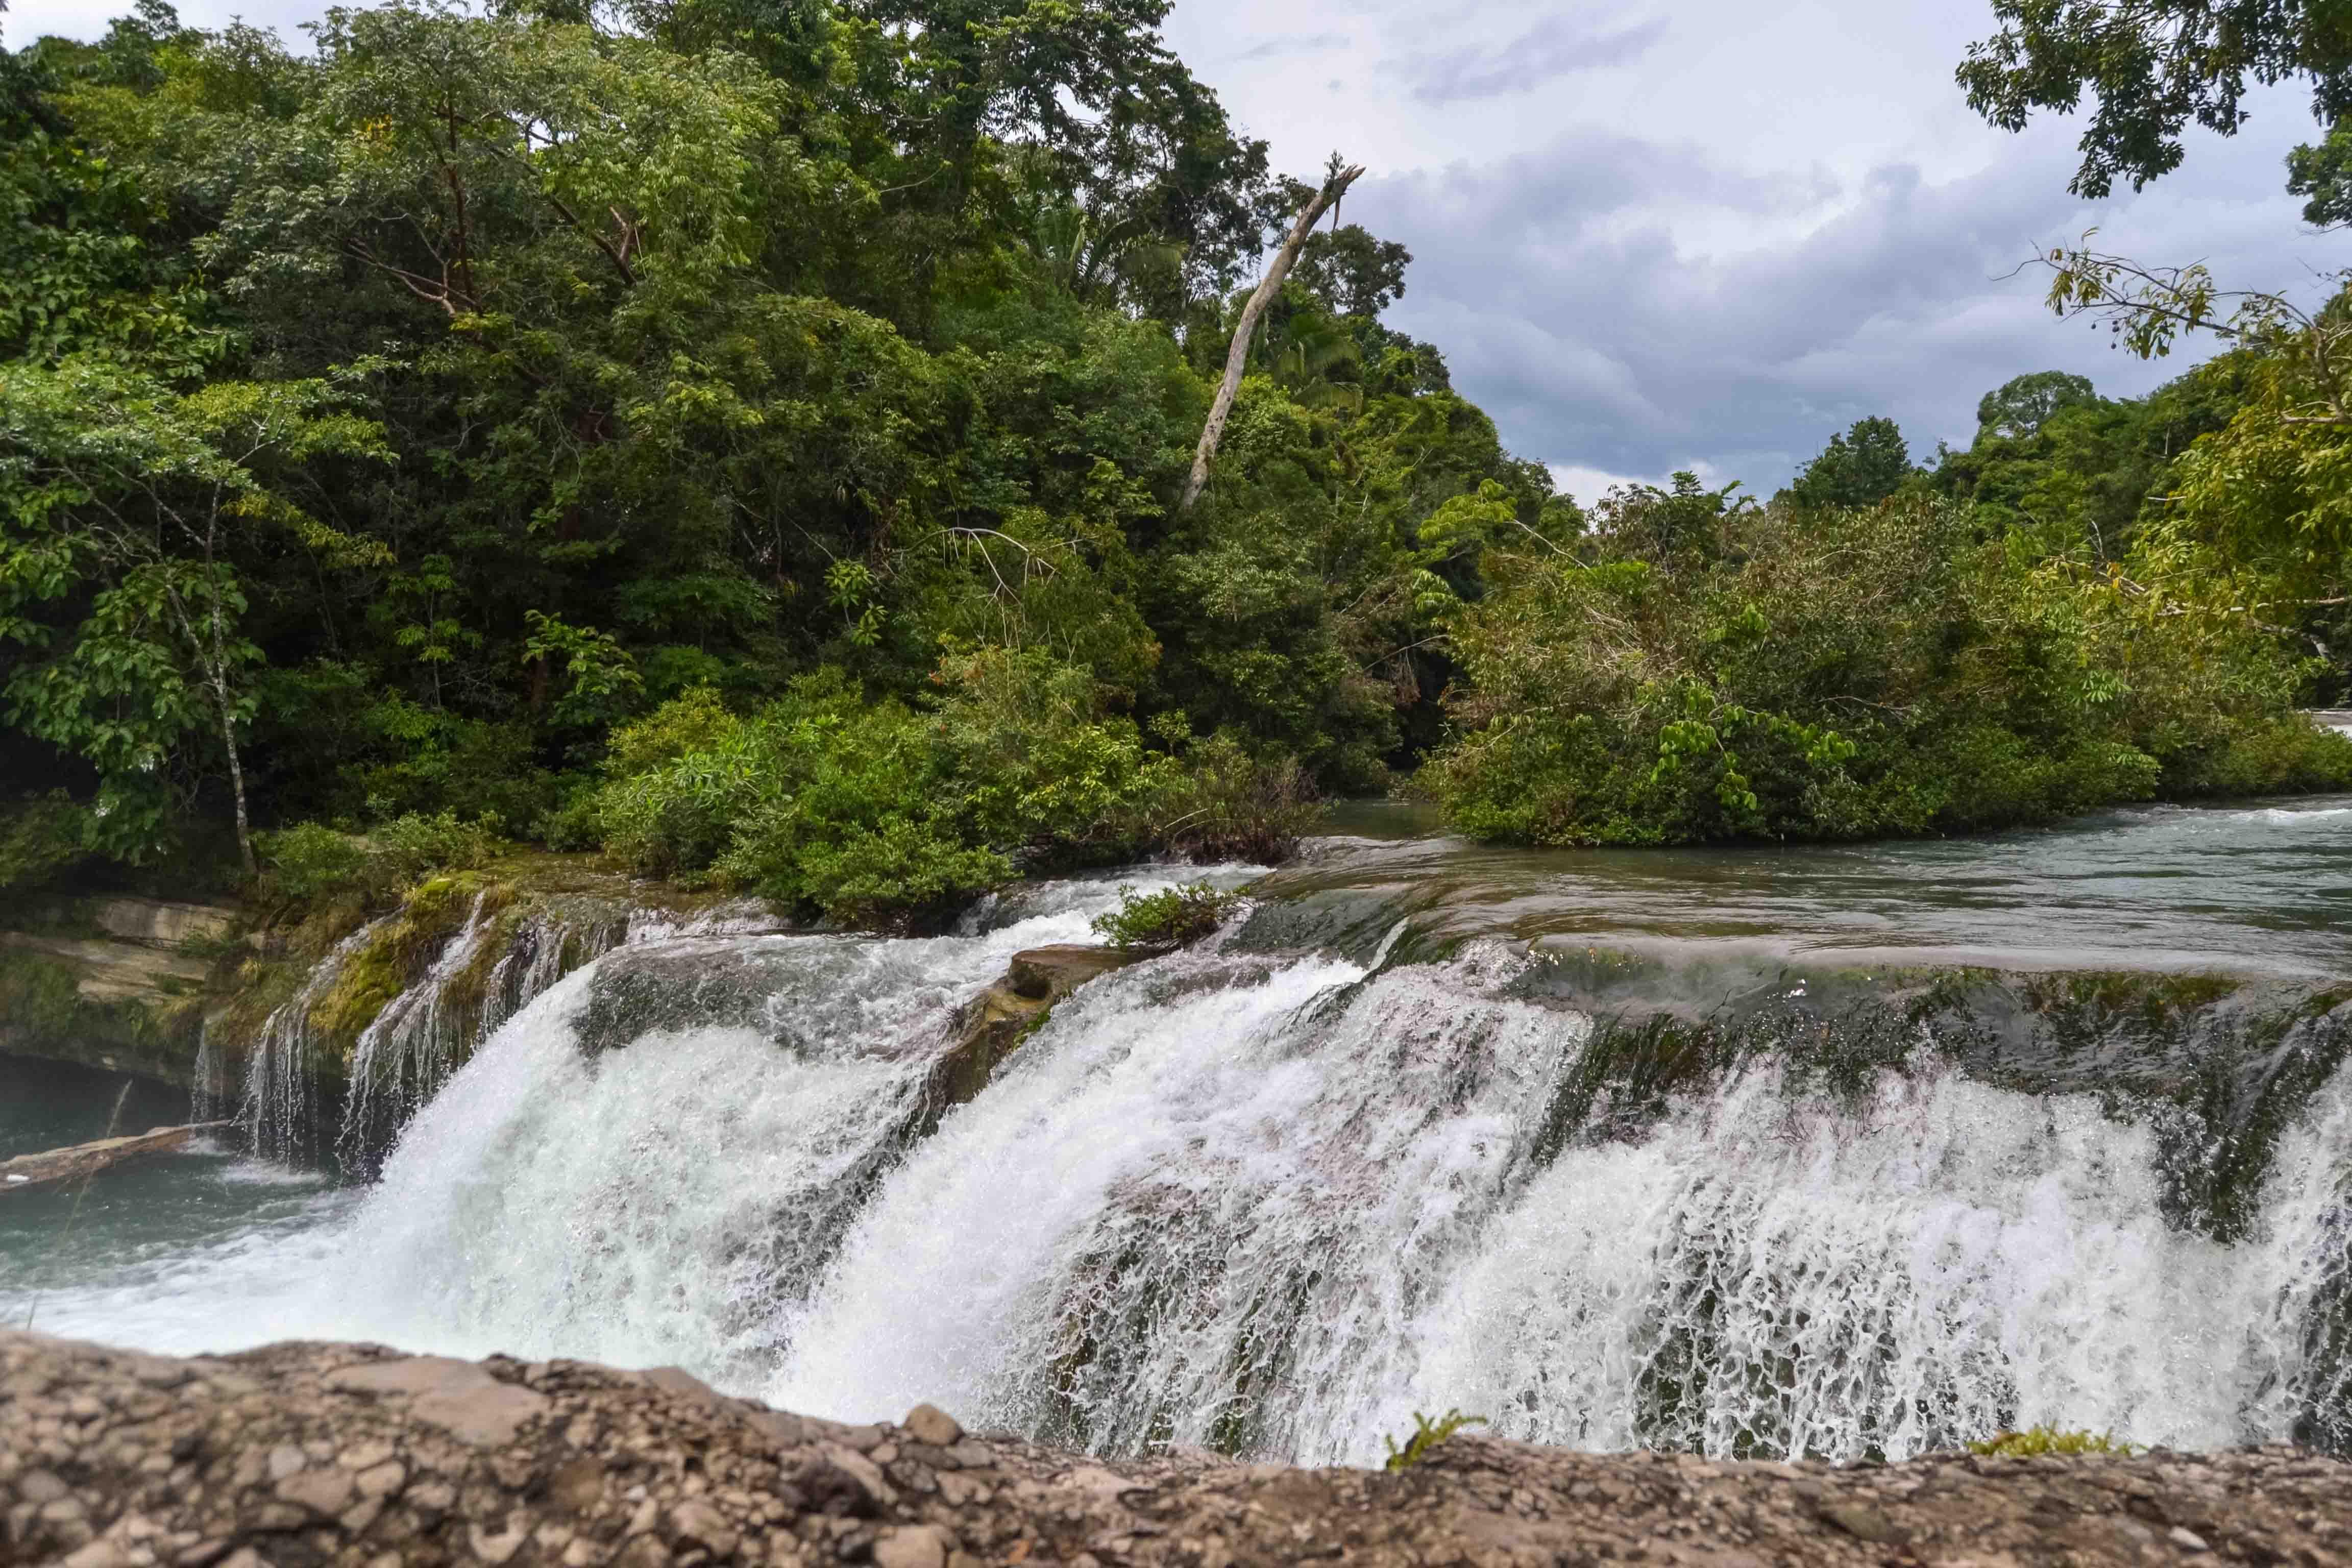 PG_Toledo_Colombia_nature_Rio_Blanco_National_Park_Hammock_Bridge